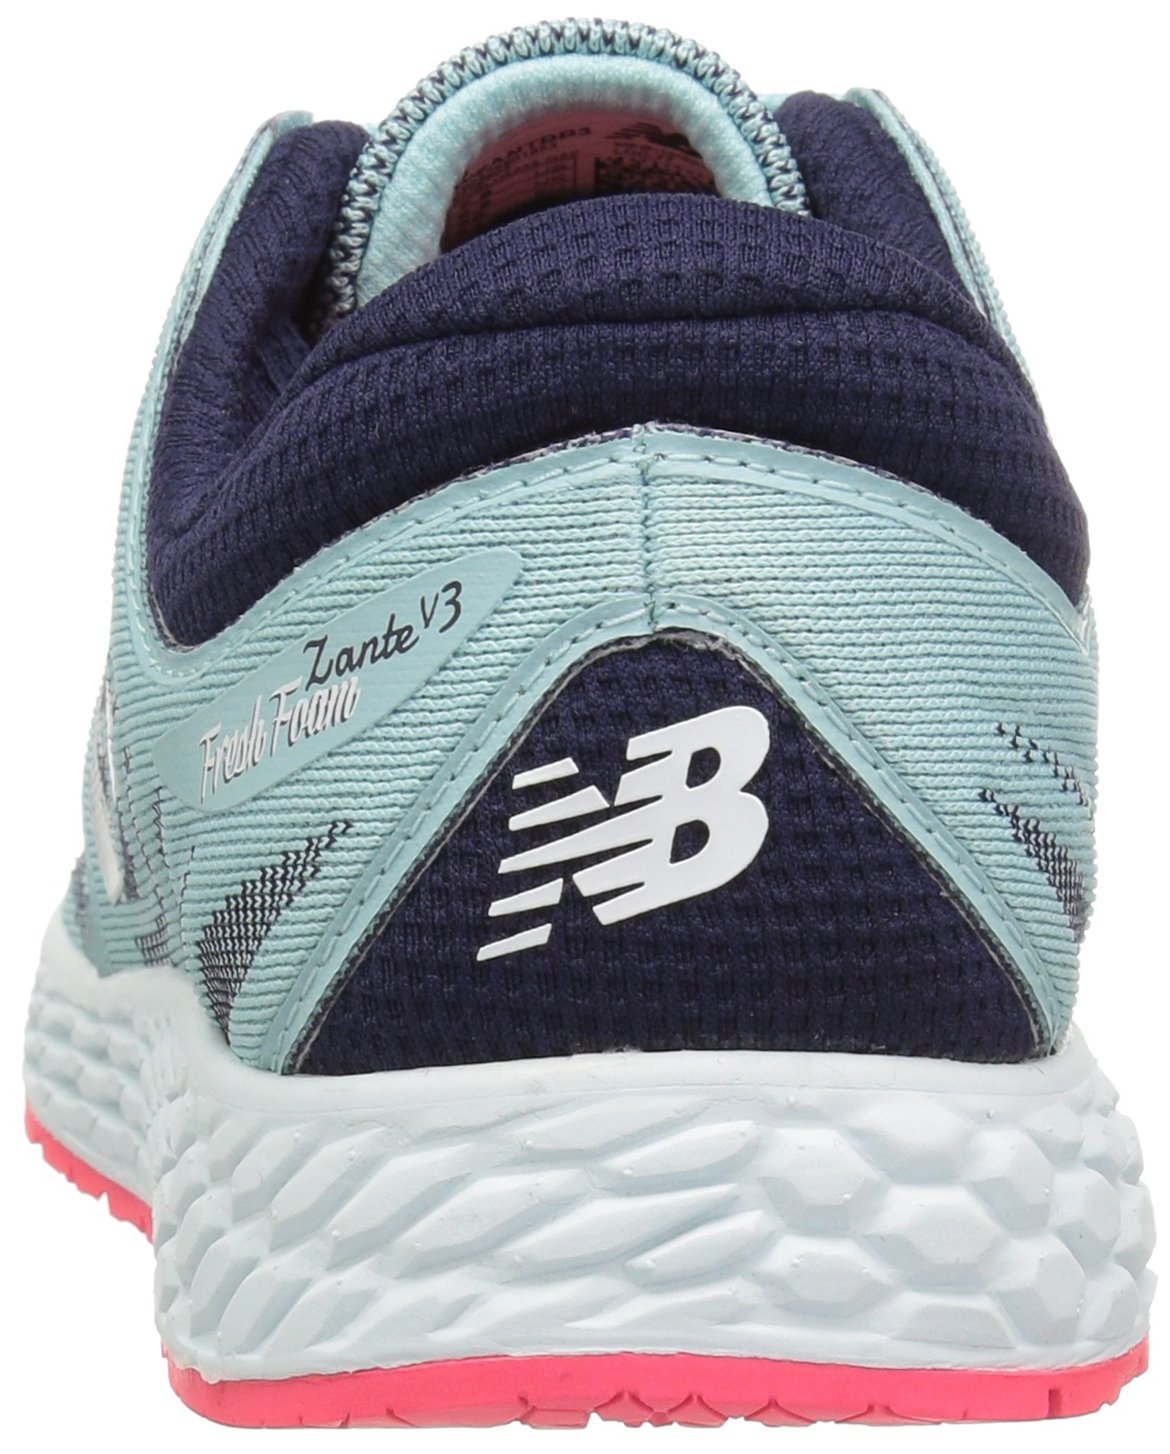 New Balance Women's ZanteV2 Breathe Running Shoe B01FSJ4KSK 6.5 D US|Ozone Blue/Bright Cherry